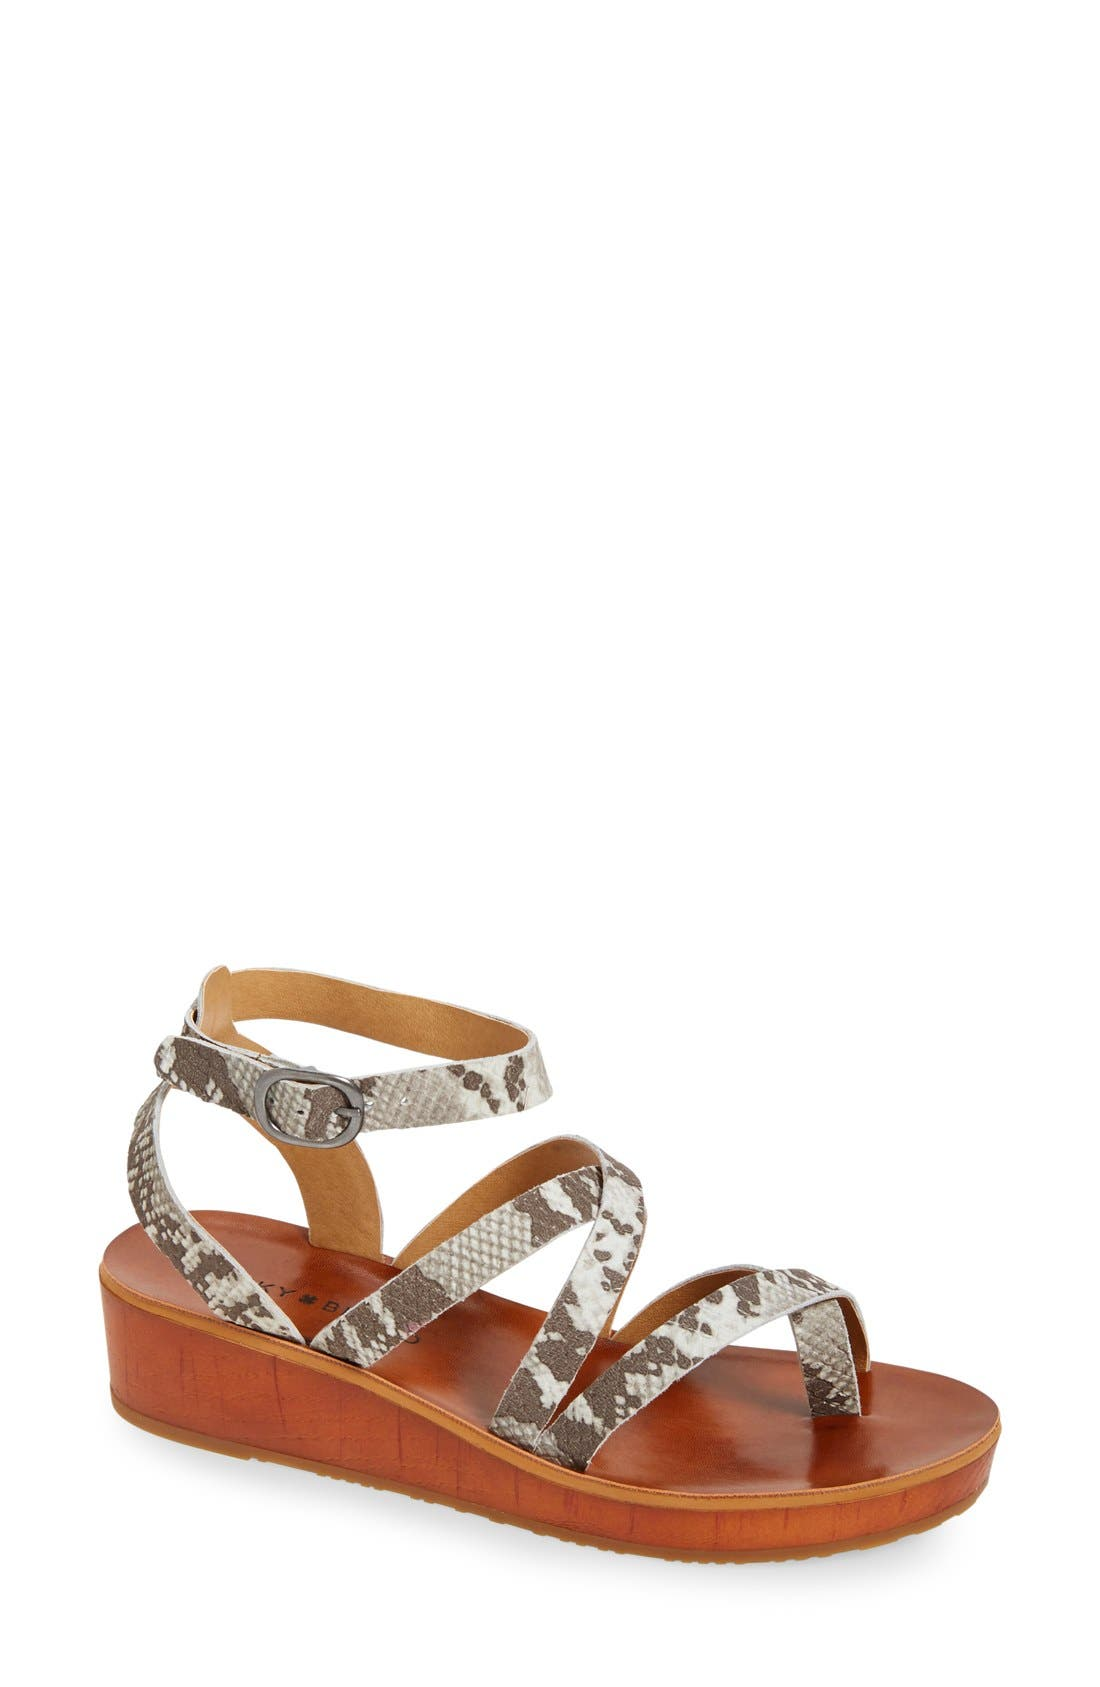 'Honeyy' Platform Sandal,                         Main,                         color, Grey Leather